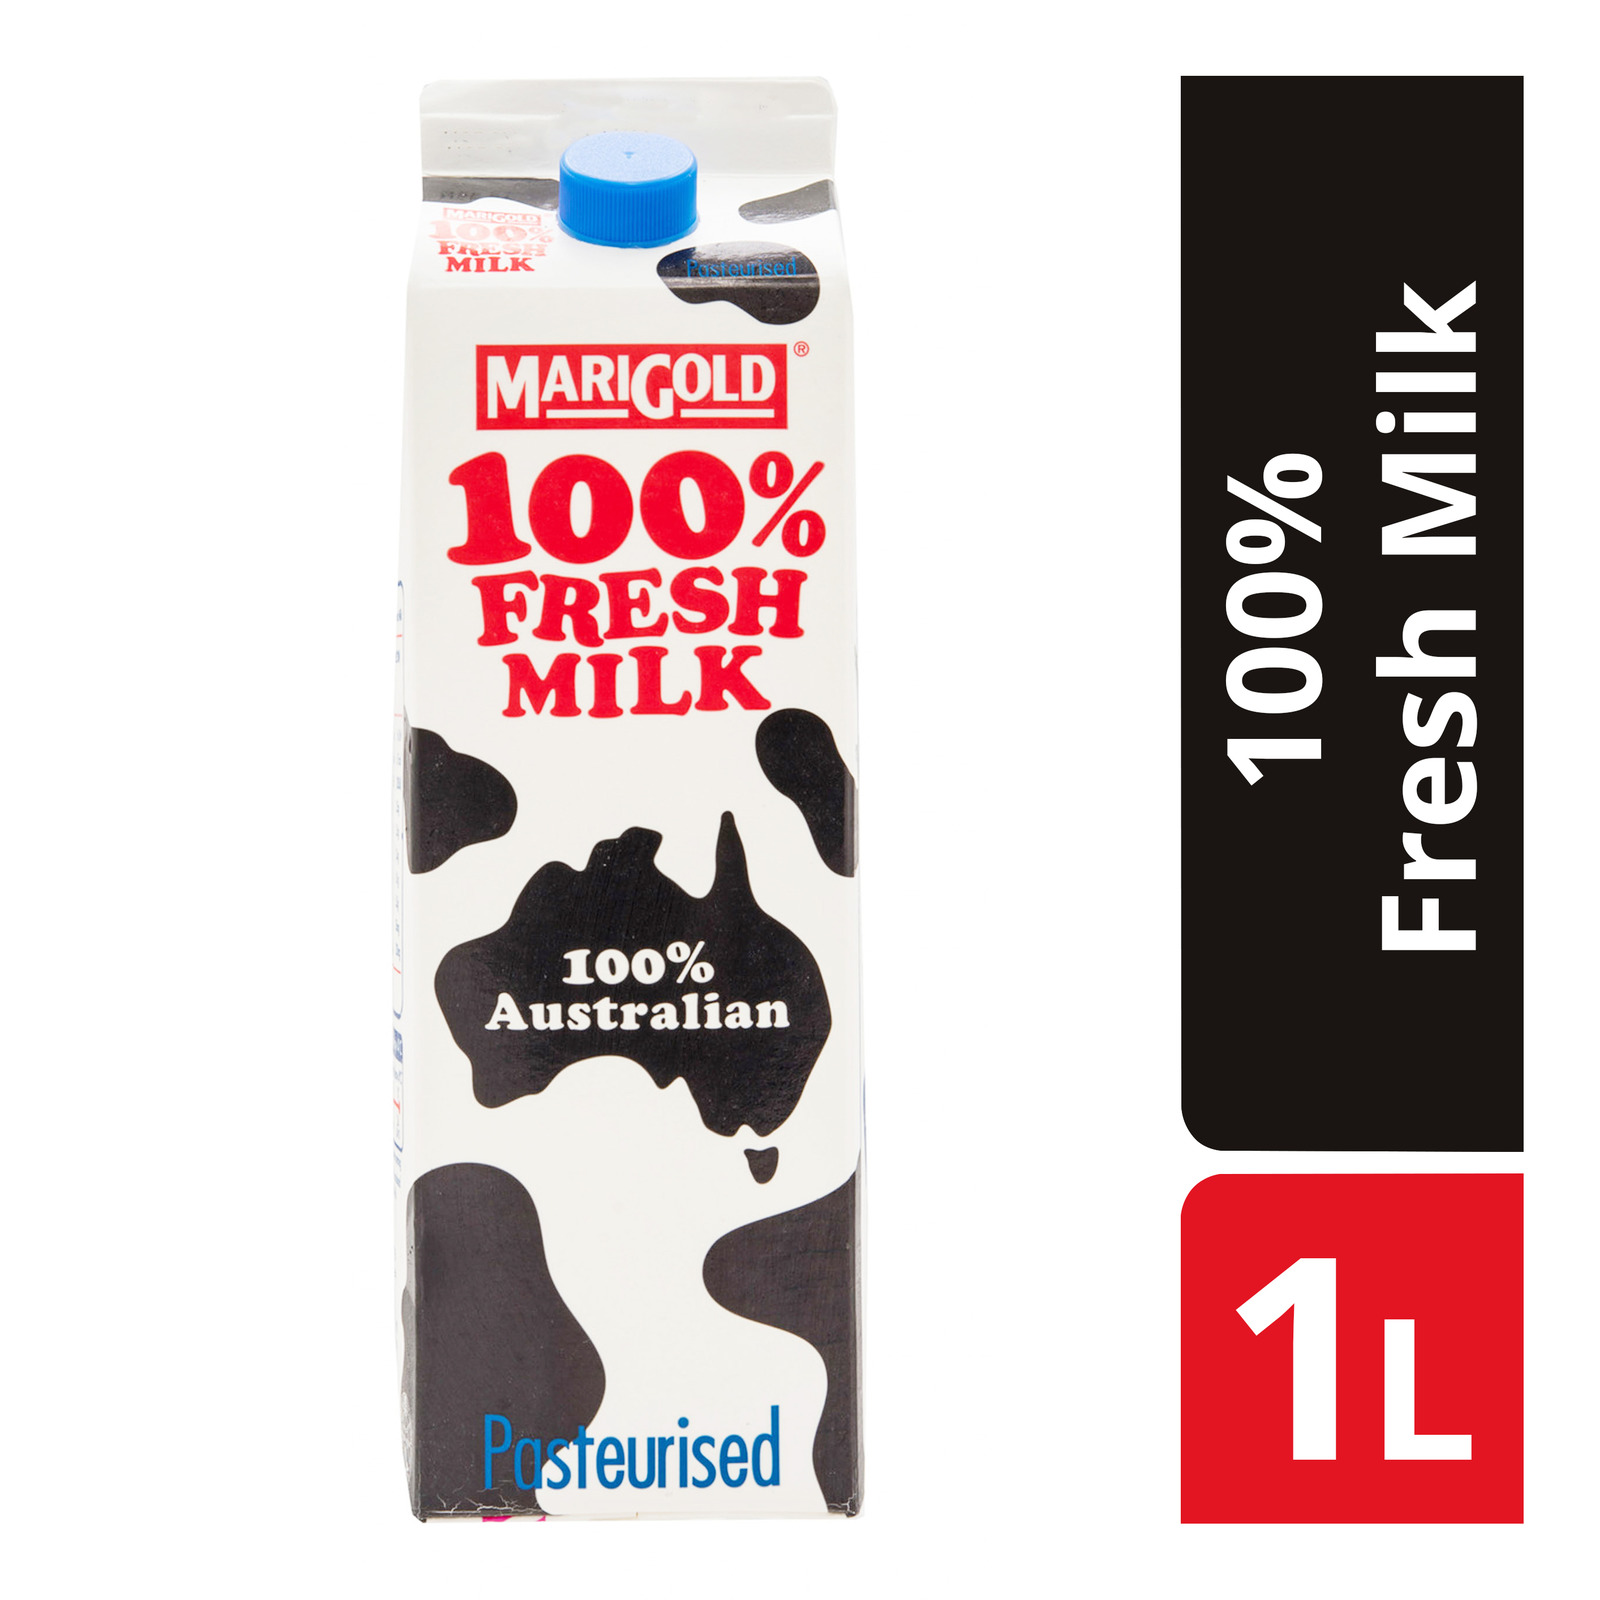 Marigold 100% Fresh Milk